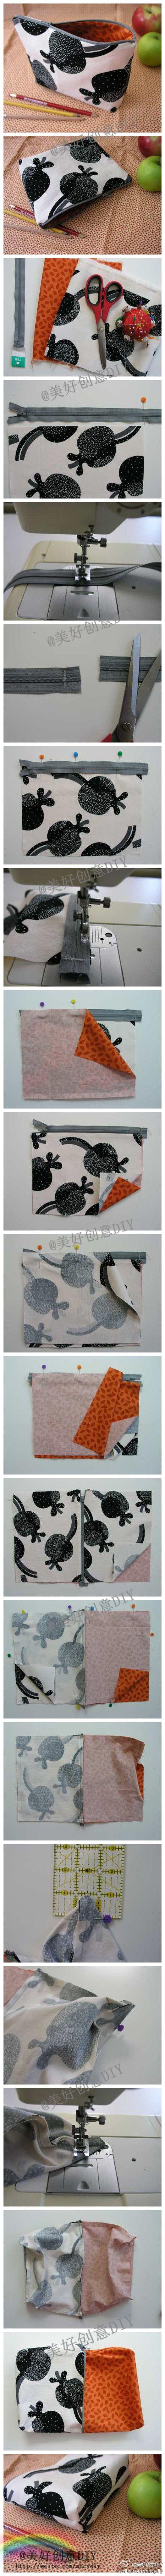 Zip bag tutorial: Zipper Pouch Tutorial, Diy And Crafts, Zipper Bags, Pencil Cases, Cosmetic Bag, Bag Tutorials, Sewing Bags